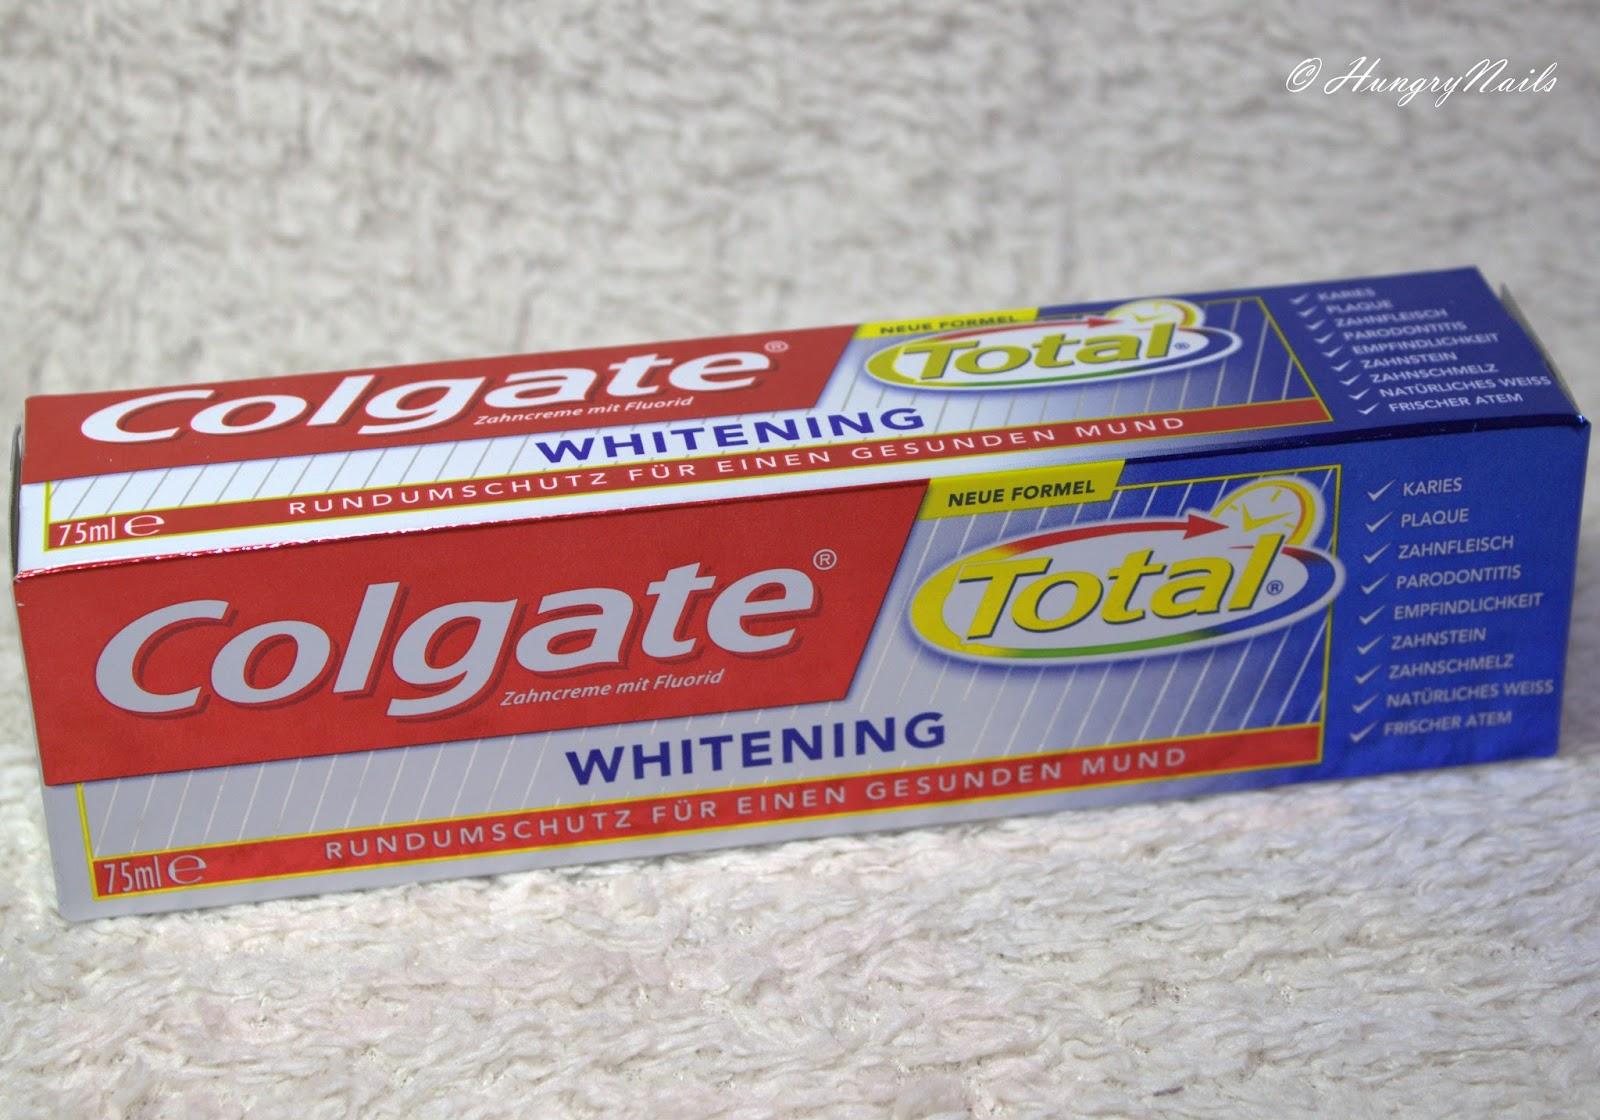 Colgate-Total-Whitening-Zahncreme